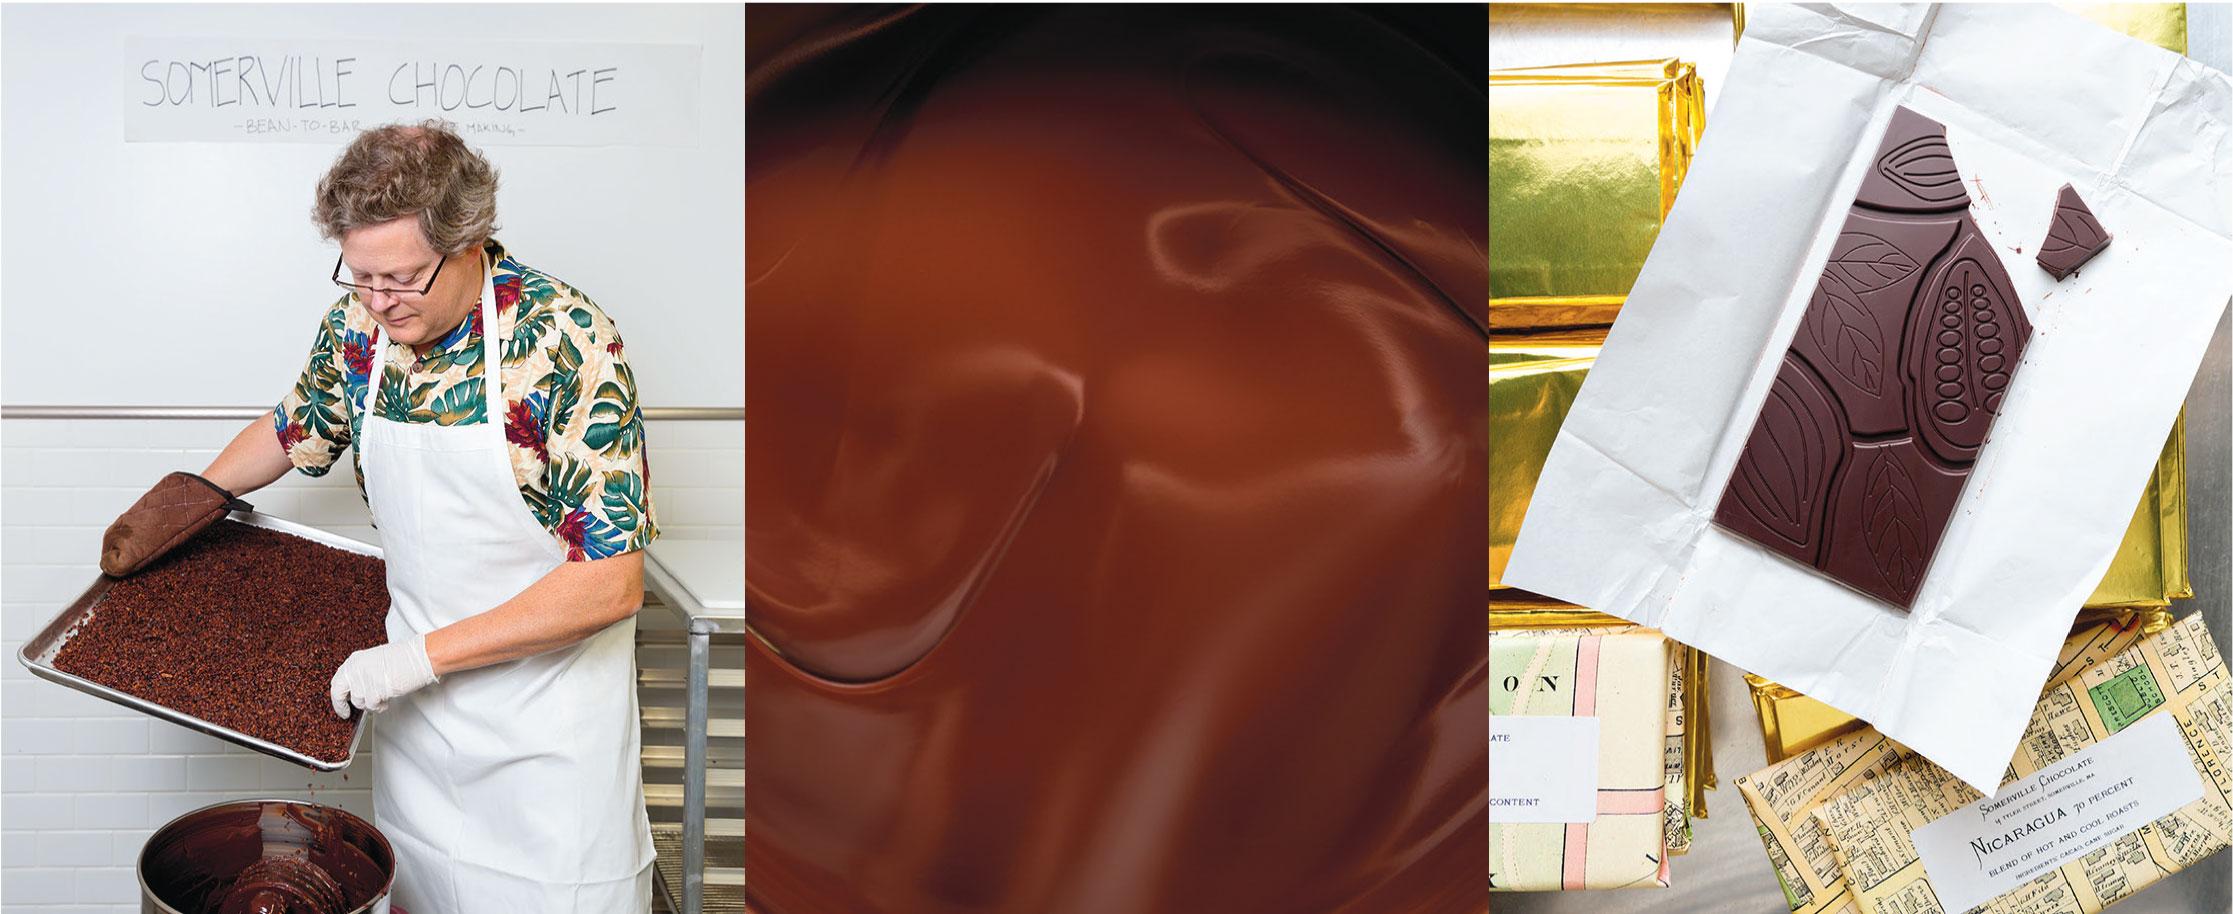 Somerville-Chocolate.jpg